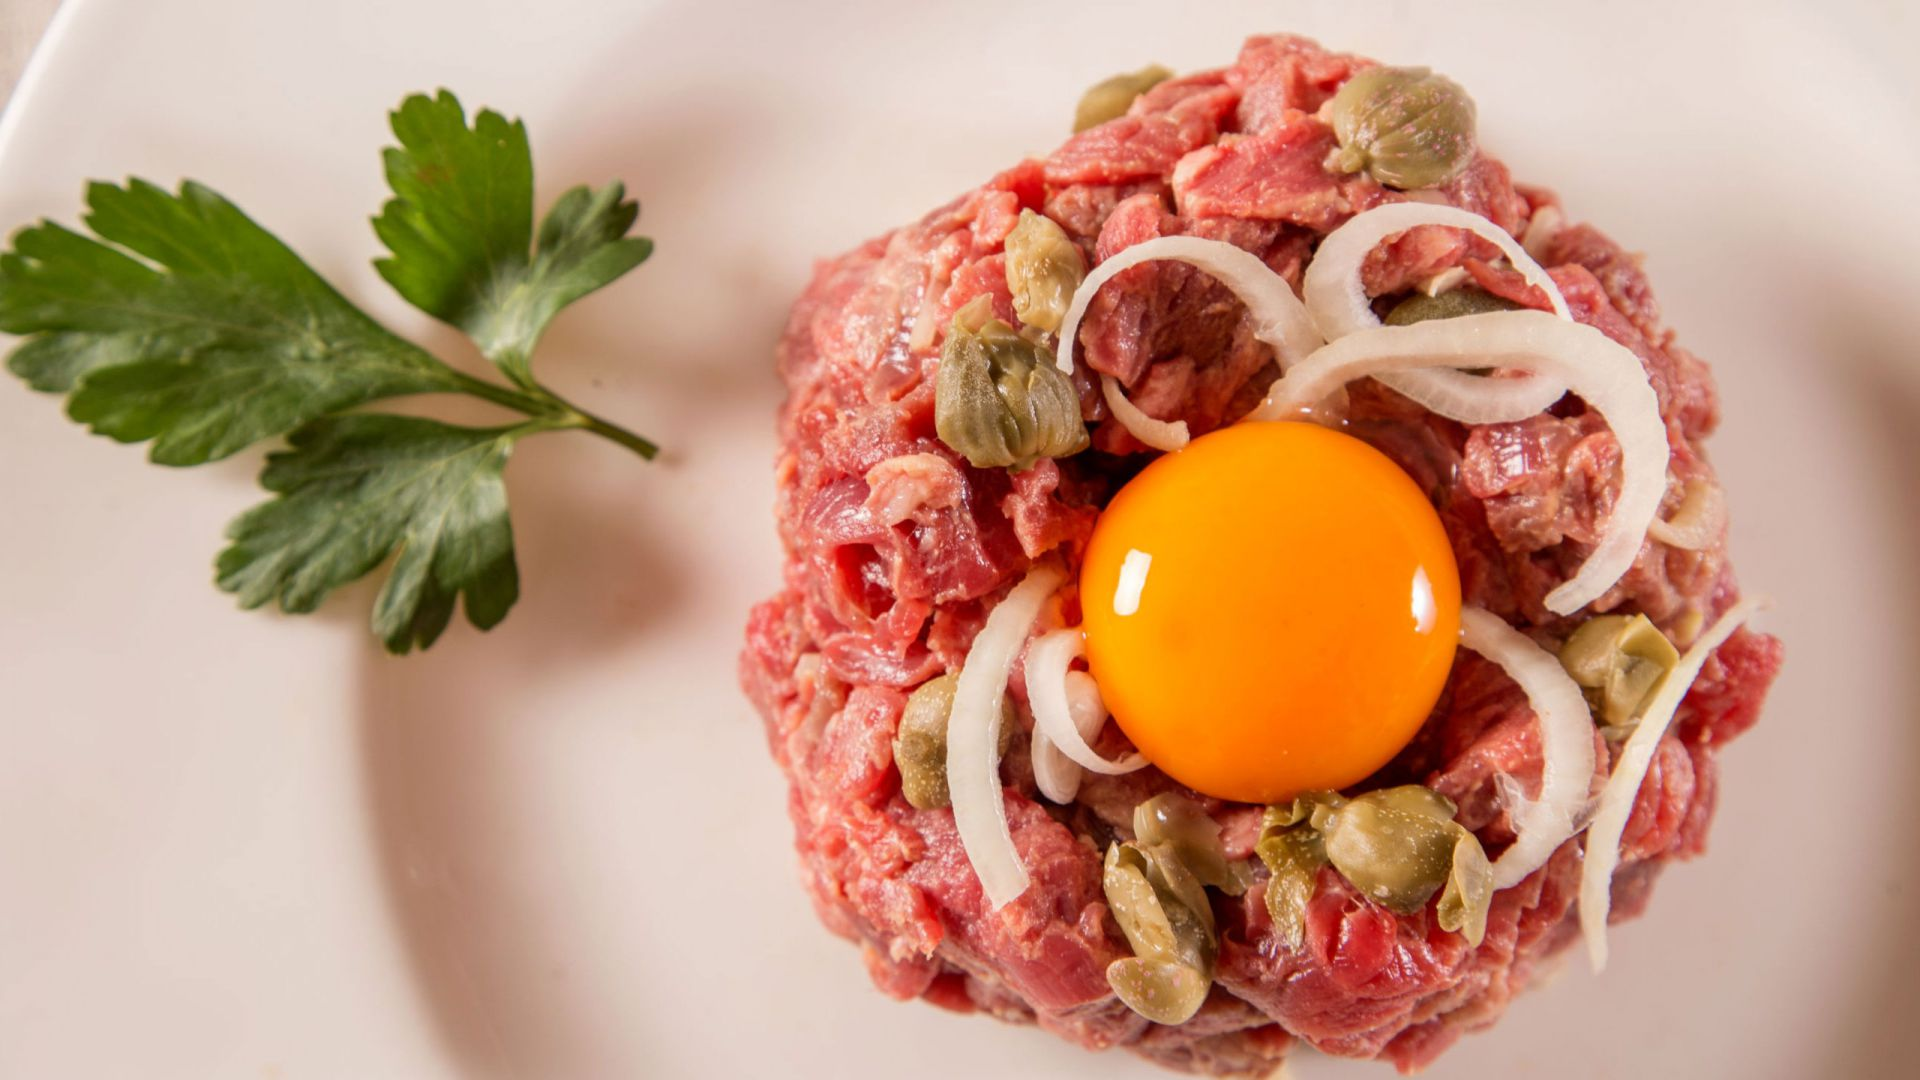 albergo-ottocento-rome-food-09